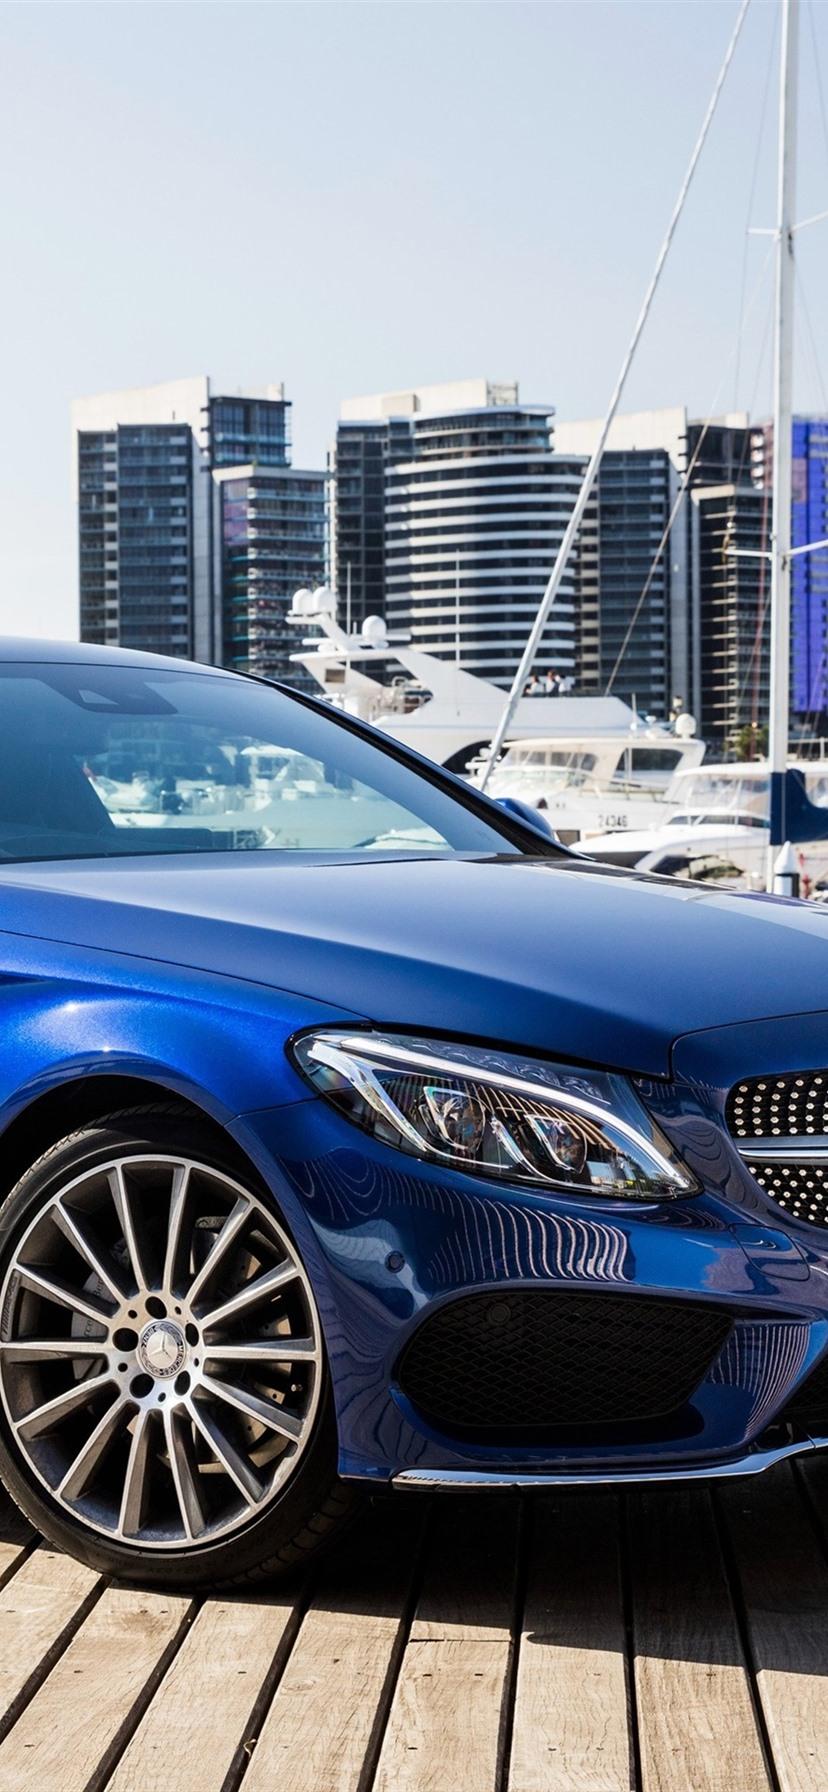 Mercedes Benz AMG C Class C21 blue Coupe 21x21 iPhone 21/21/21 ...